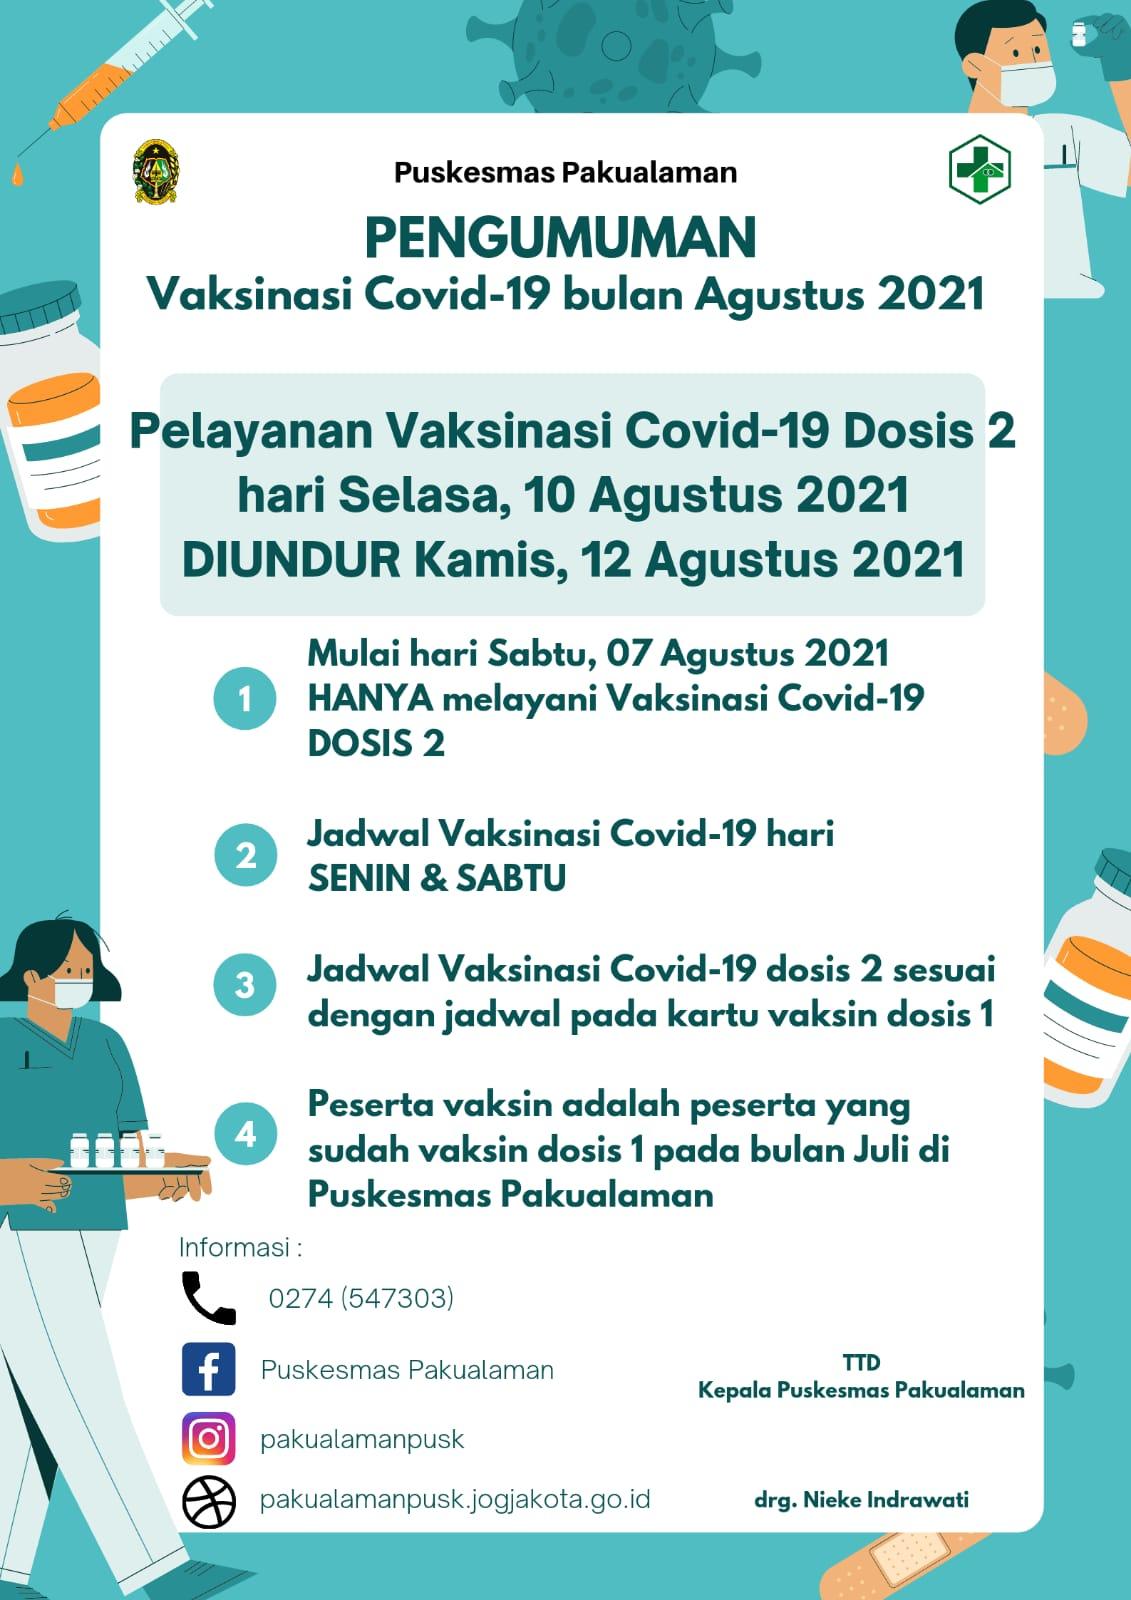 PENGUMUMAN VAKSINASI COVID-19 DOSIS 2 SINOVAC